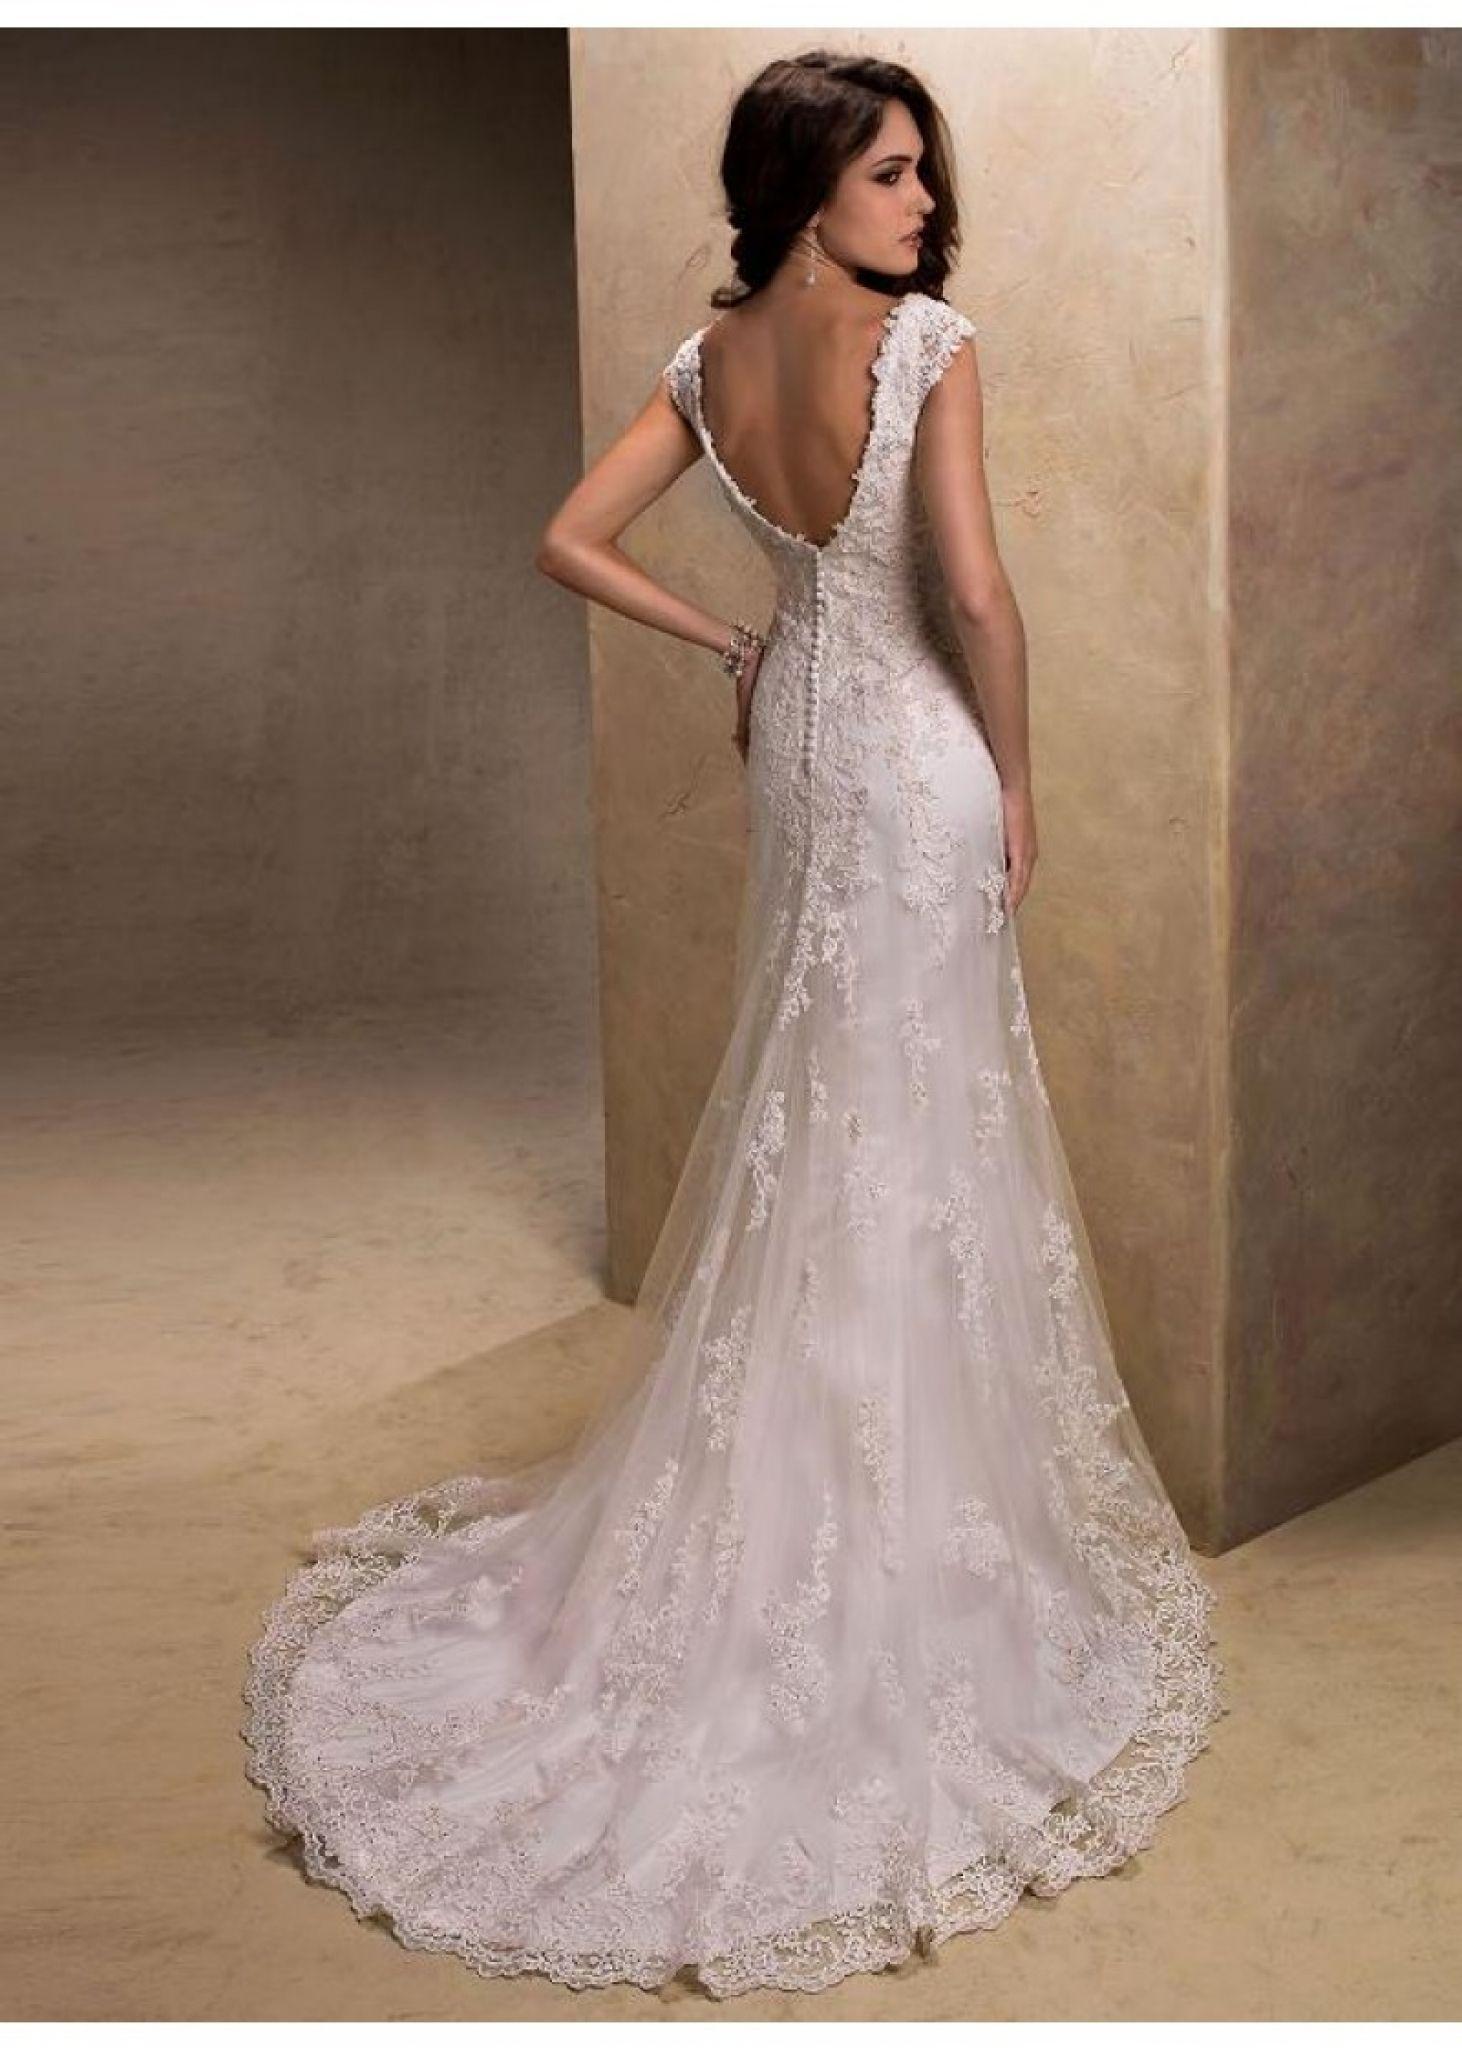 Mature bride wedding dresses  designer lace wedding dresses  wedding dresses for the mature bride